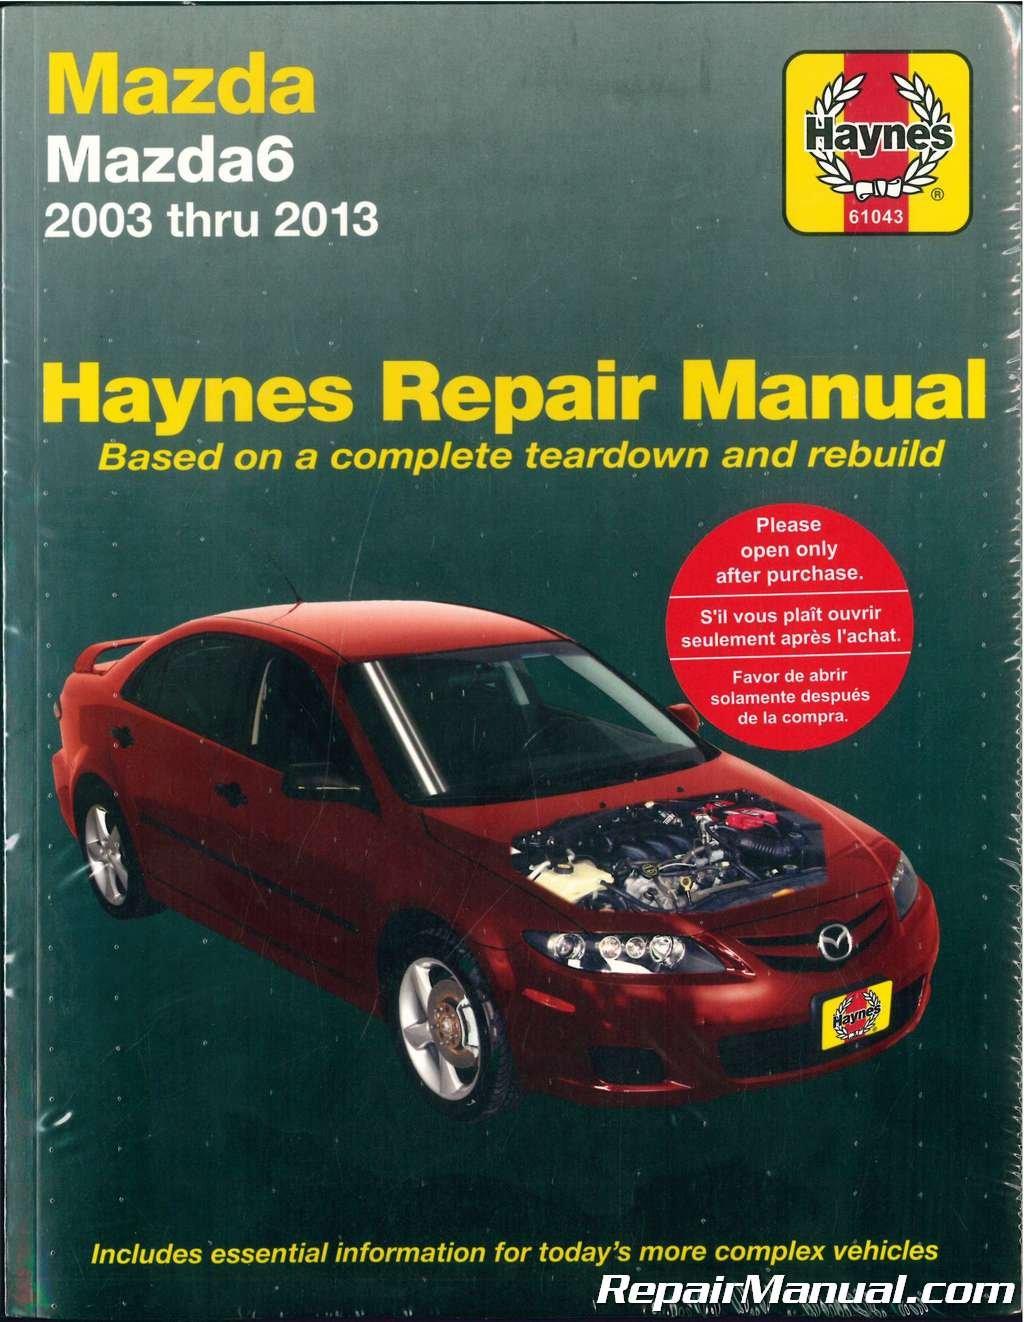 Mazda 3 Service Manual: General Procedures (Steering)